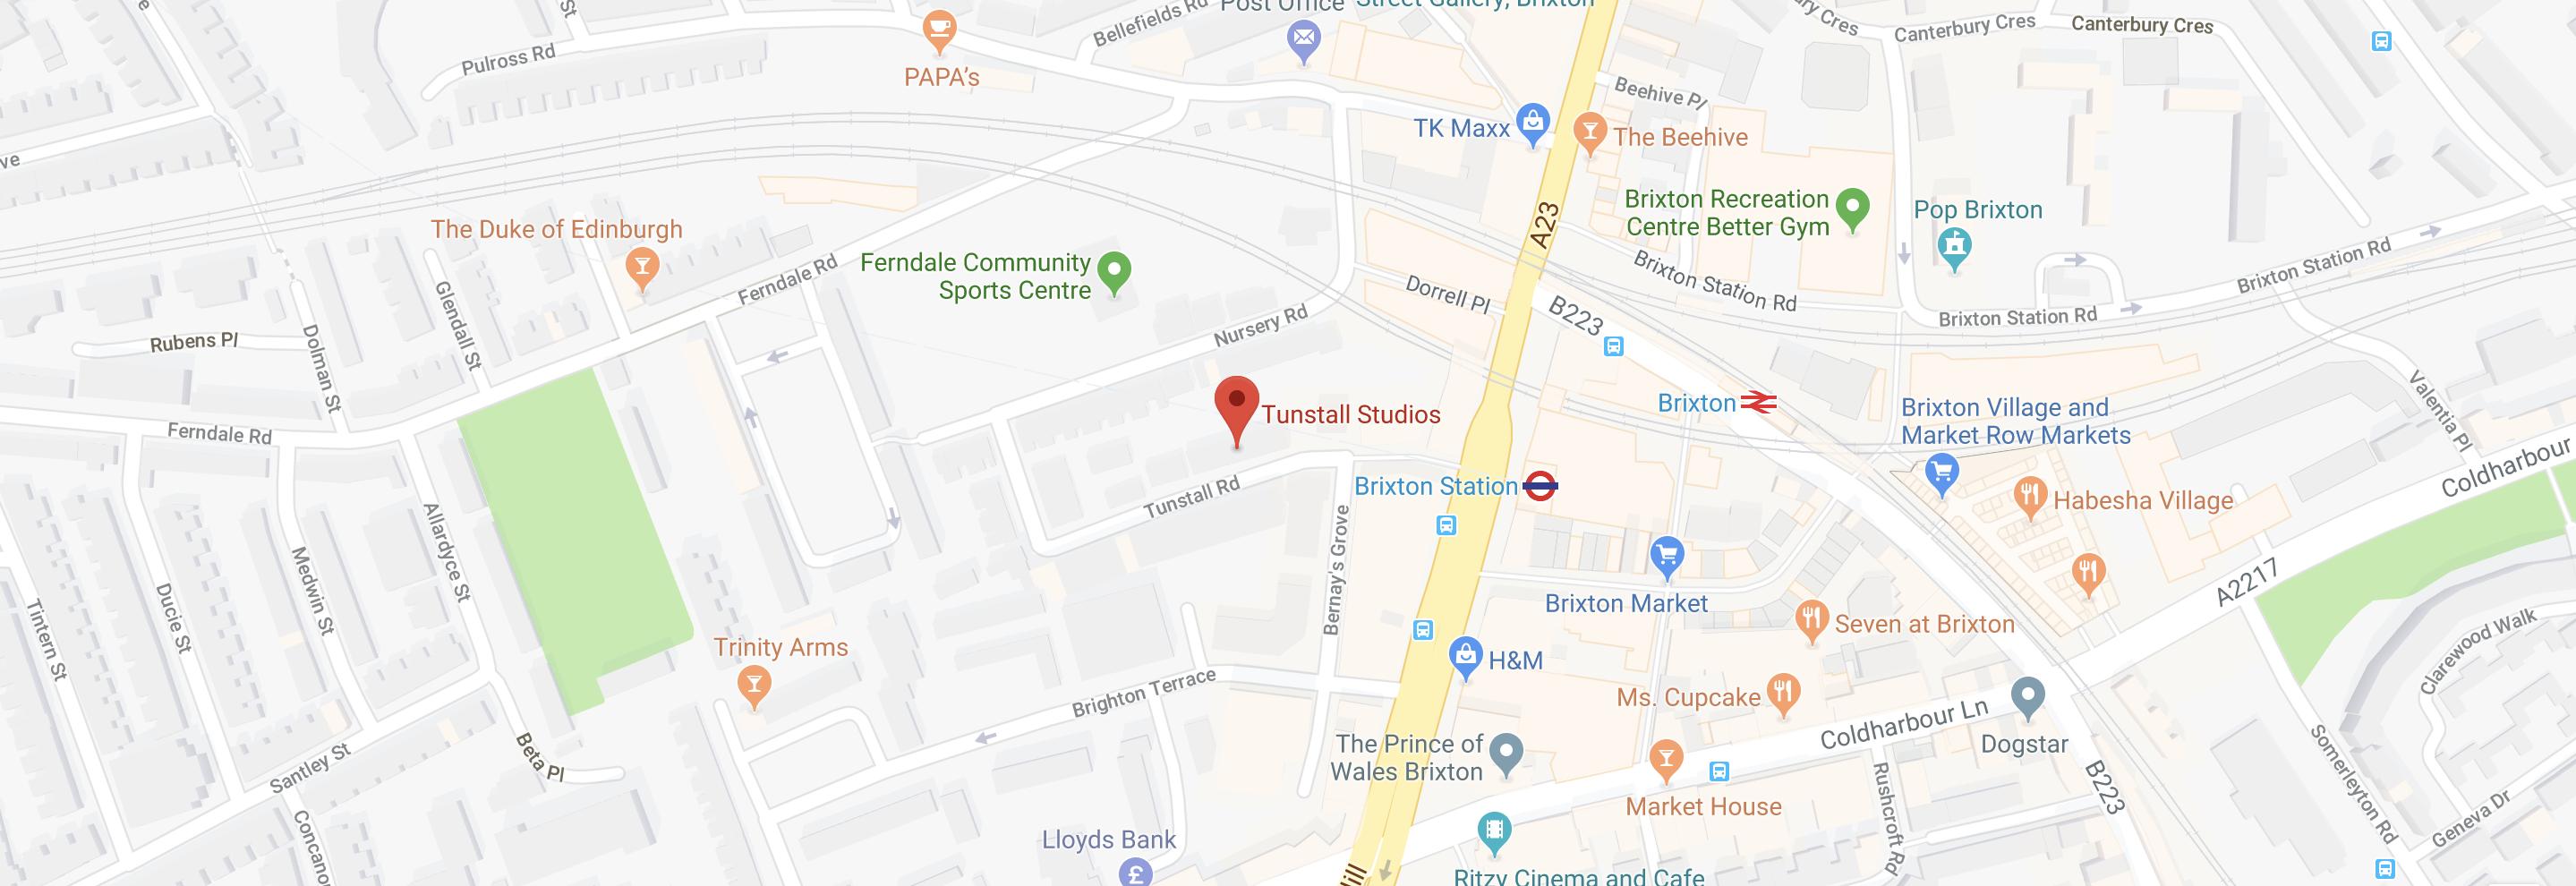 Tunstall Studios, 34-44 Tunstall Road, Brixton, SW9 8DA